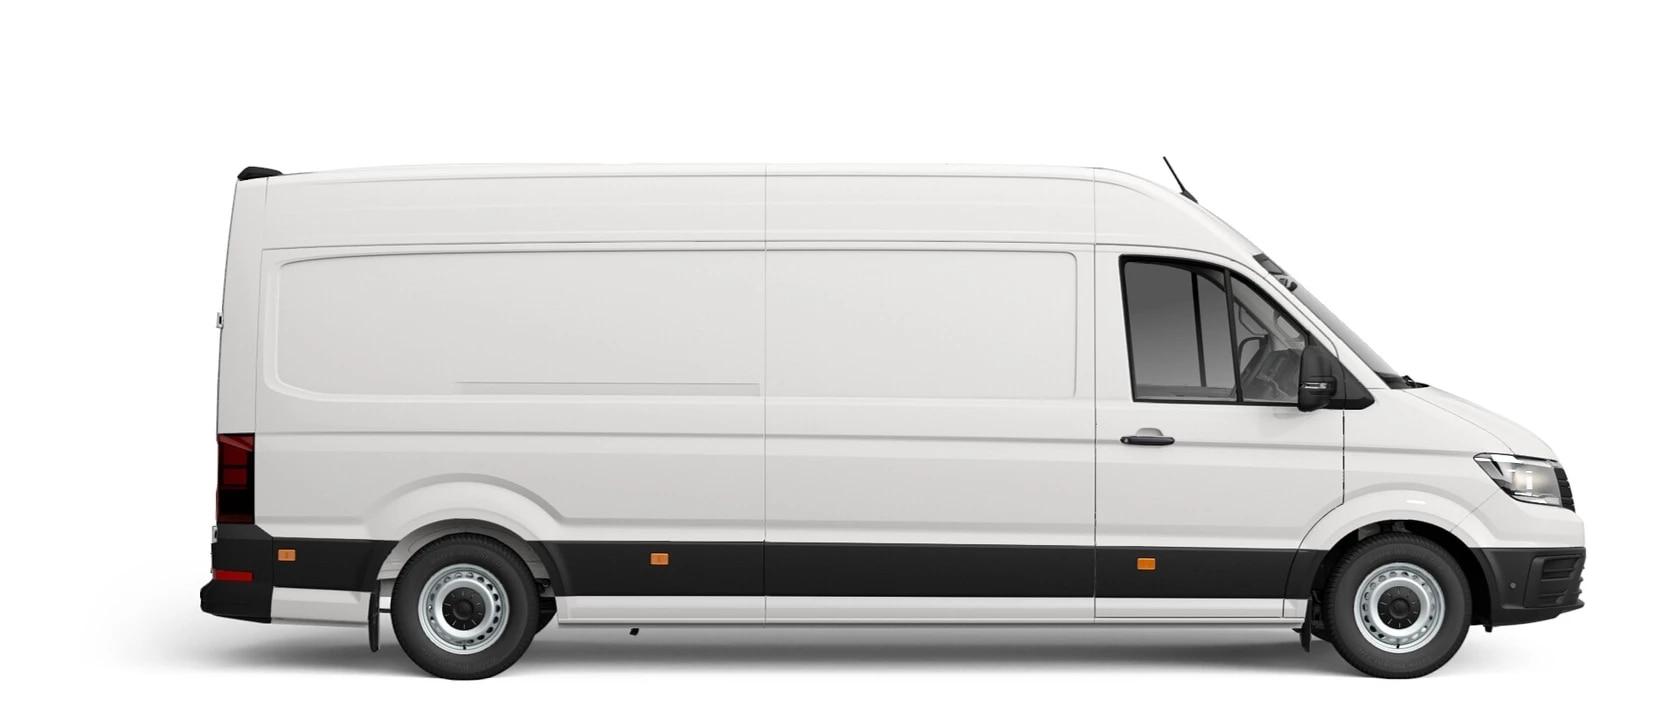 2019 MY20 Volkswagen Crafter SY1 35 Runner LWB Van